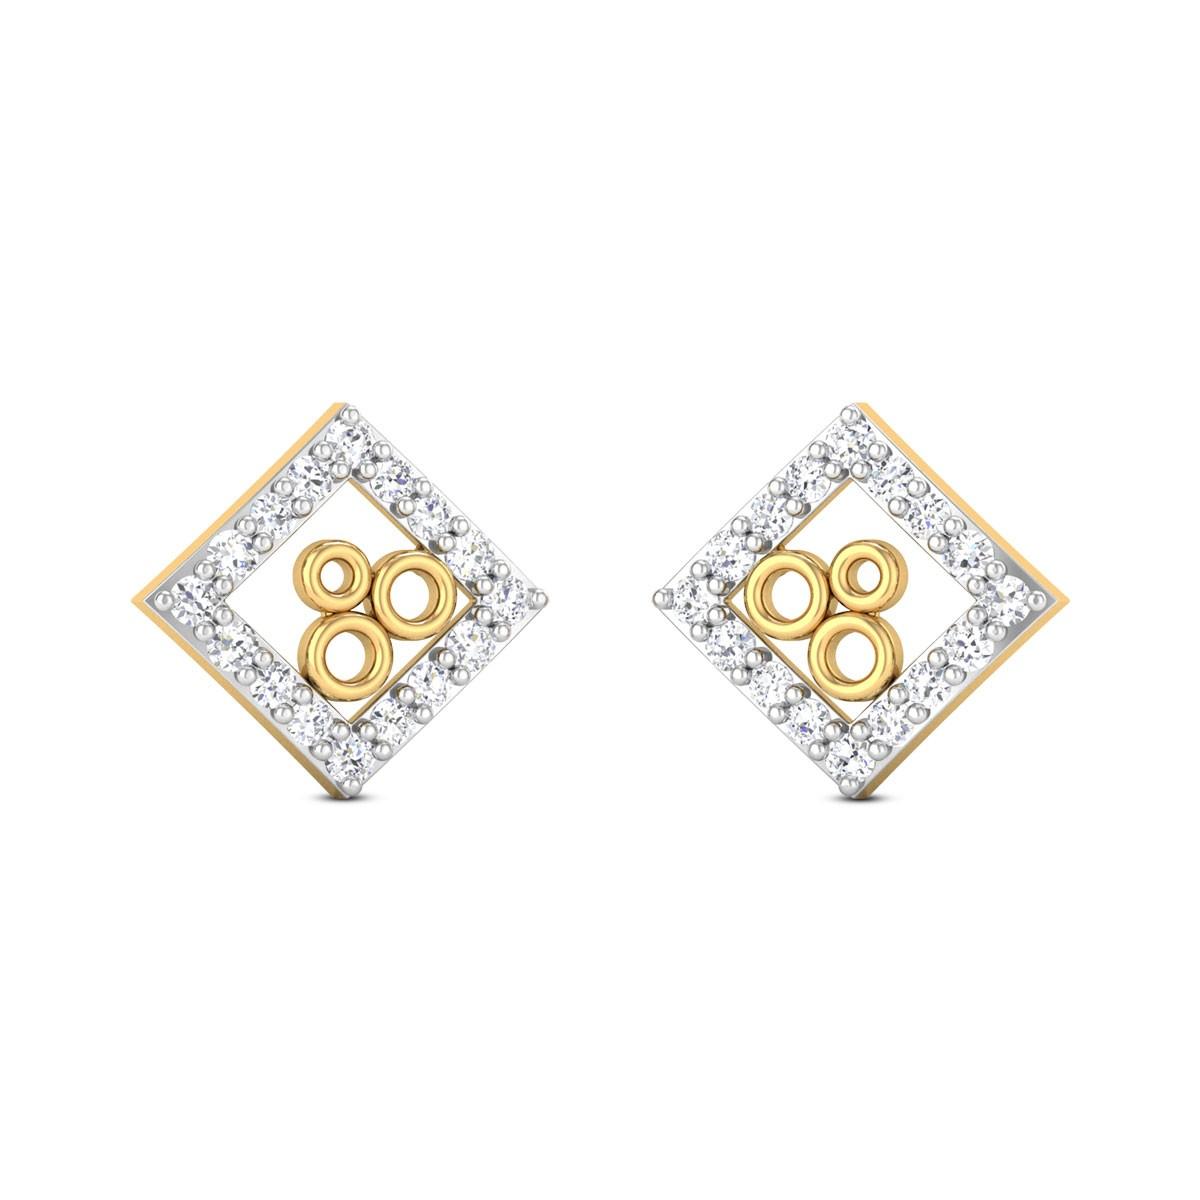 Eleonora Diamond Earrings